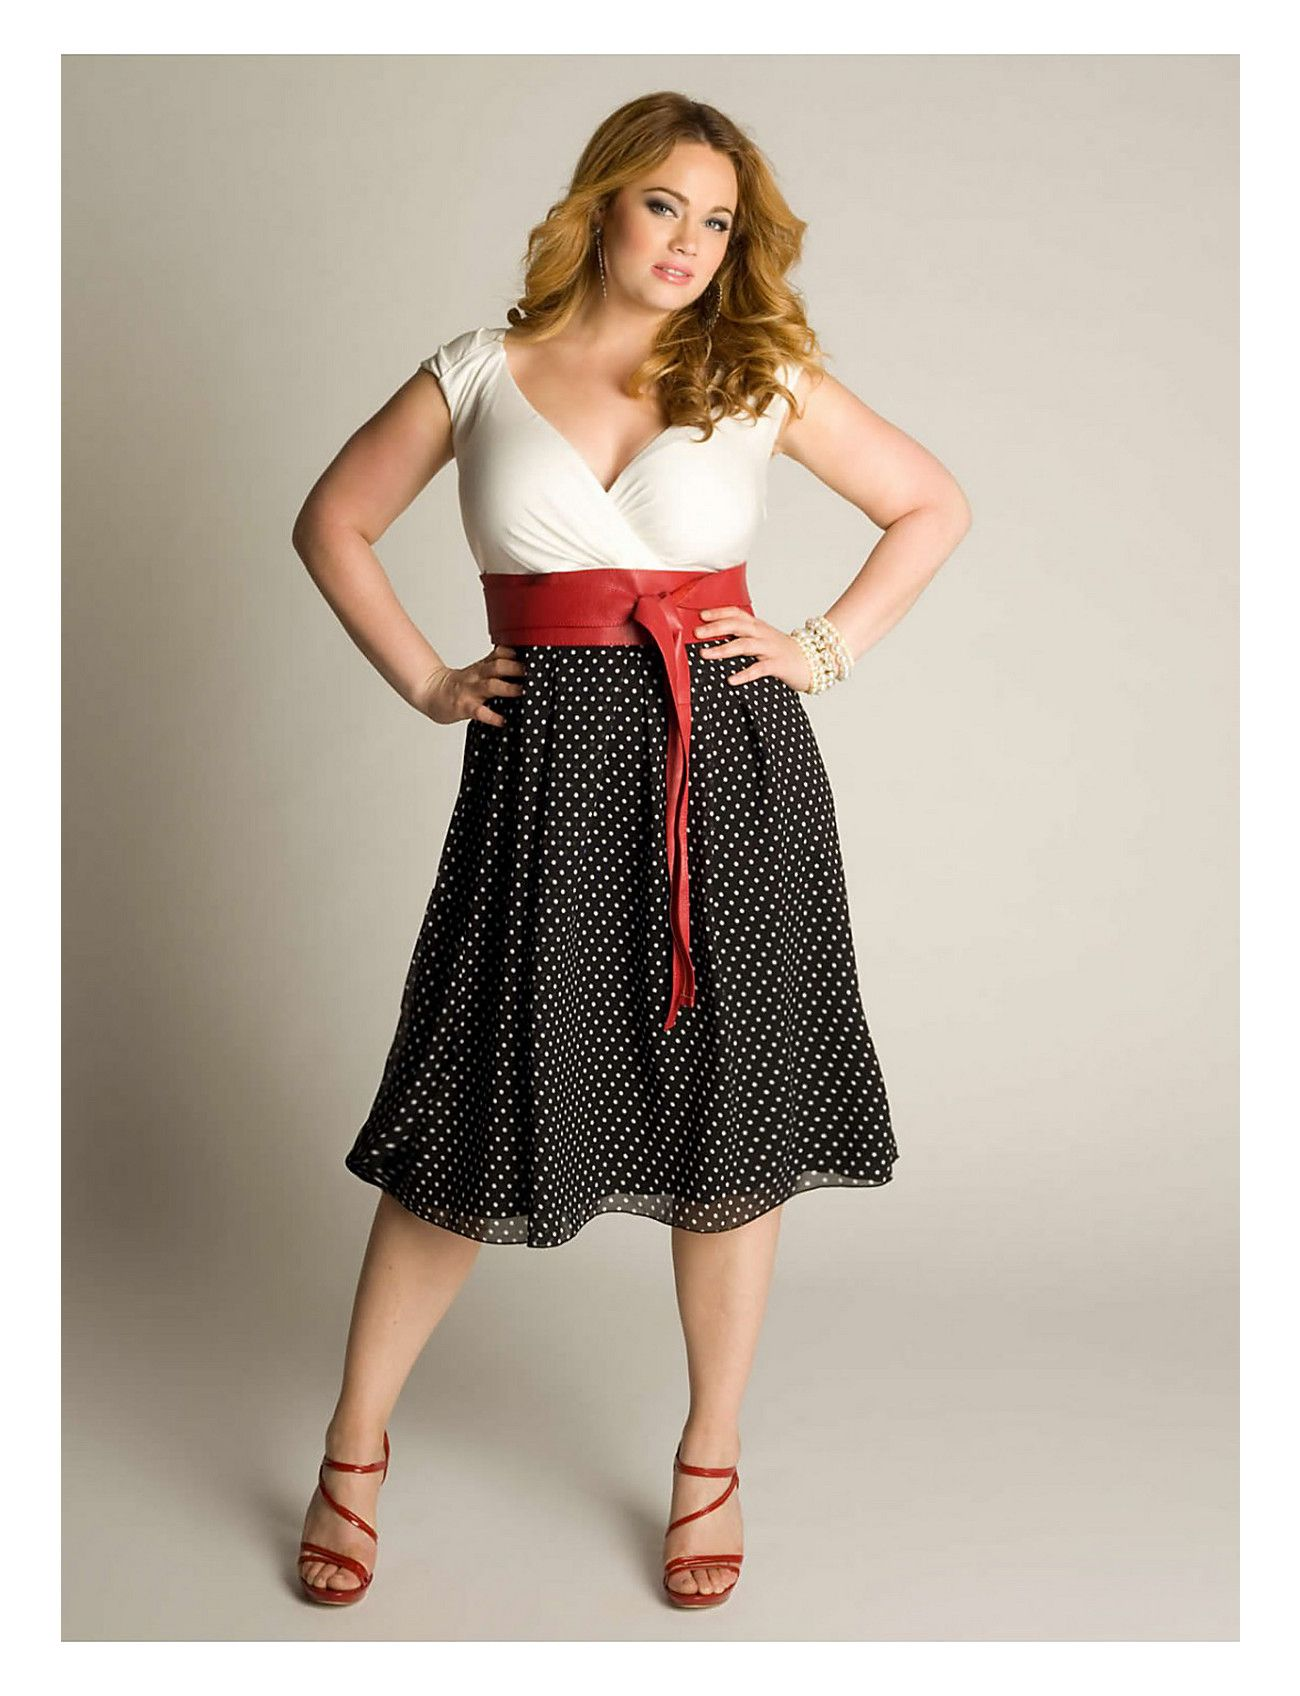 0917ce430b1 The Millie  Vintage Polka Dot Dress from  IGIGI is sexy